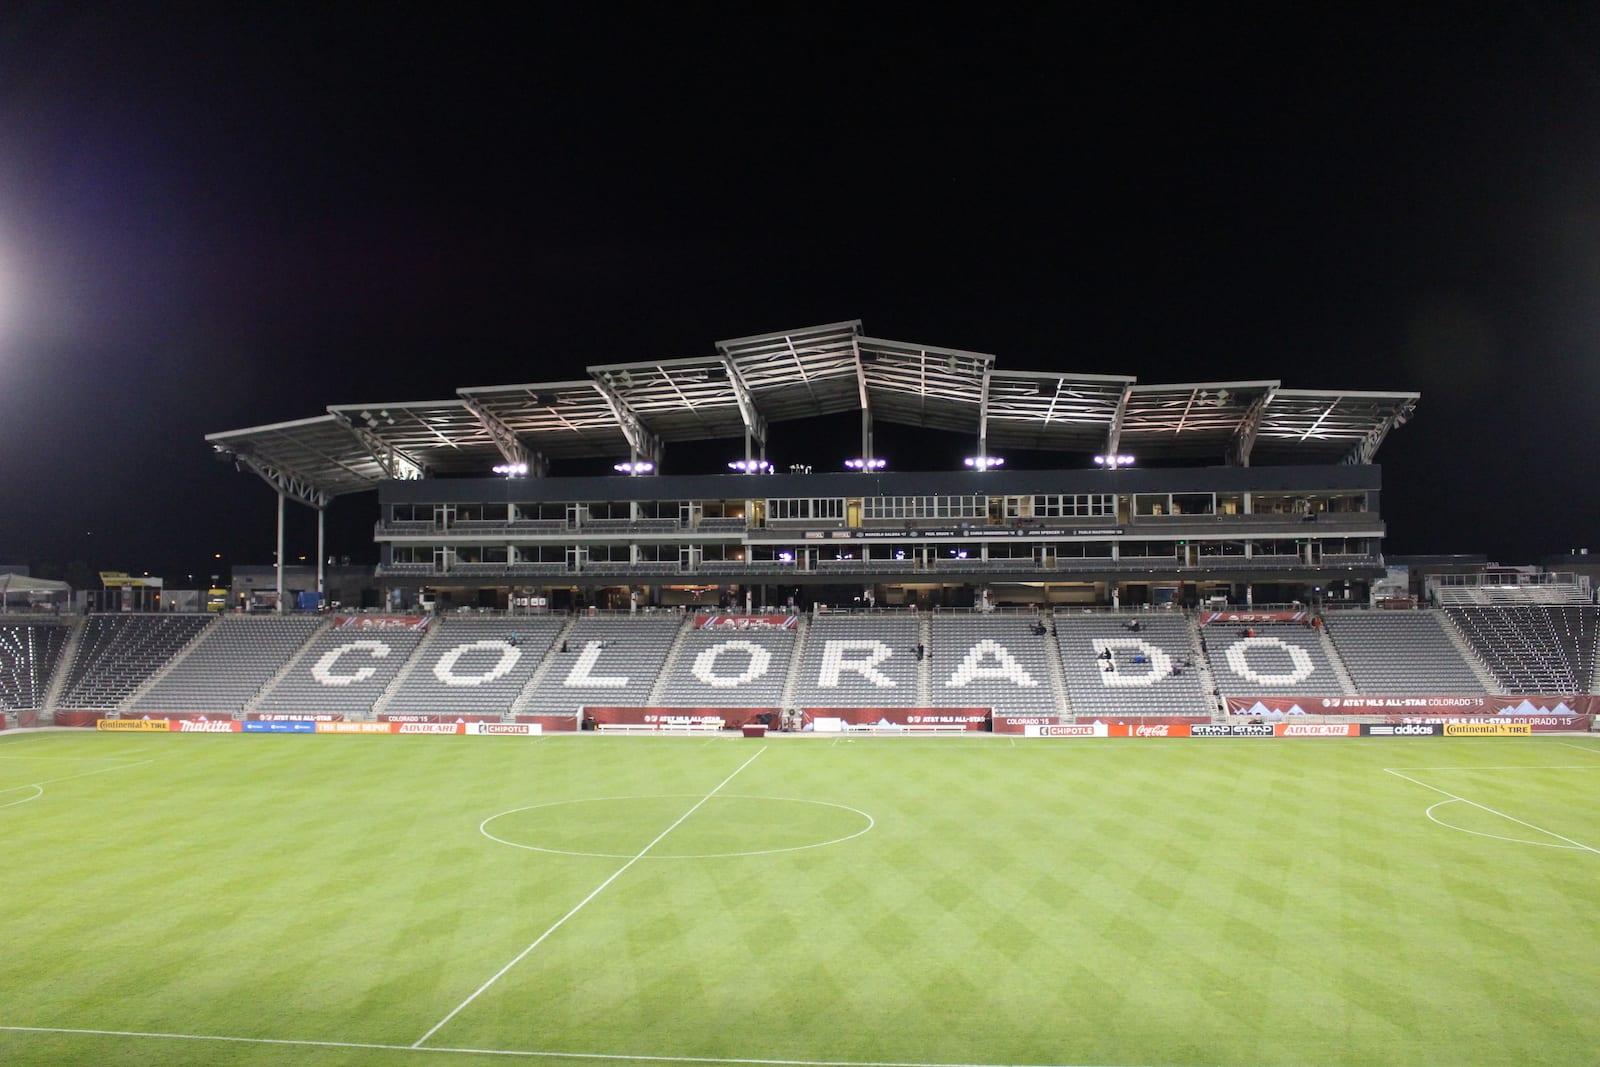 Dick's Sporting Goods Park Commerce City Colorado Rapids Bleachers